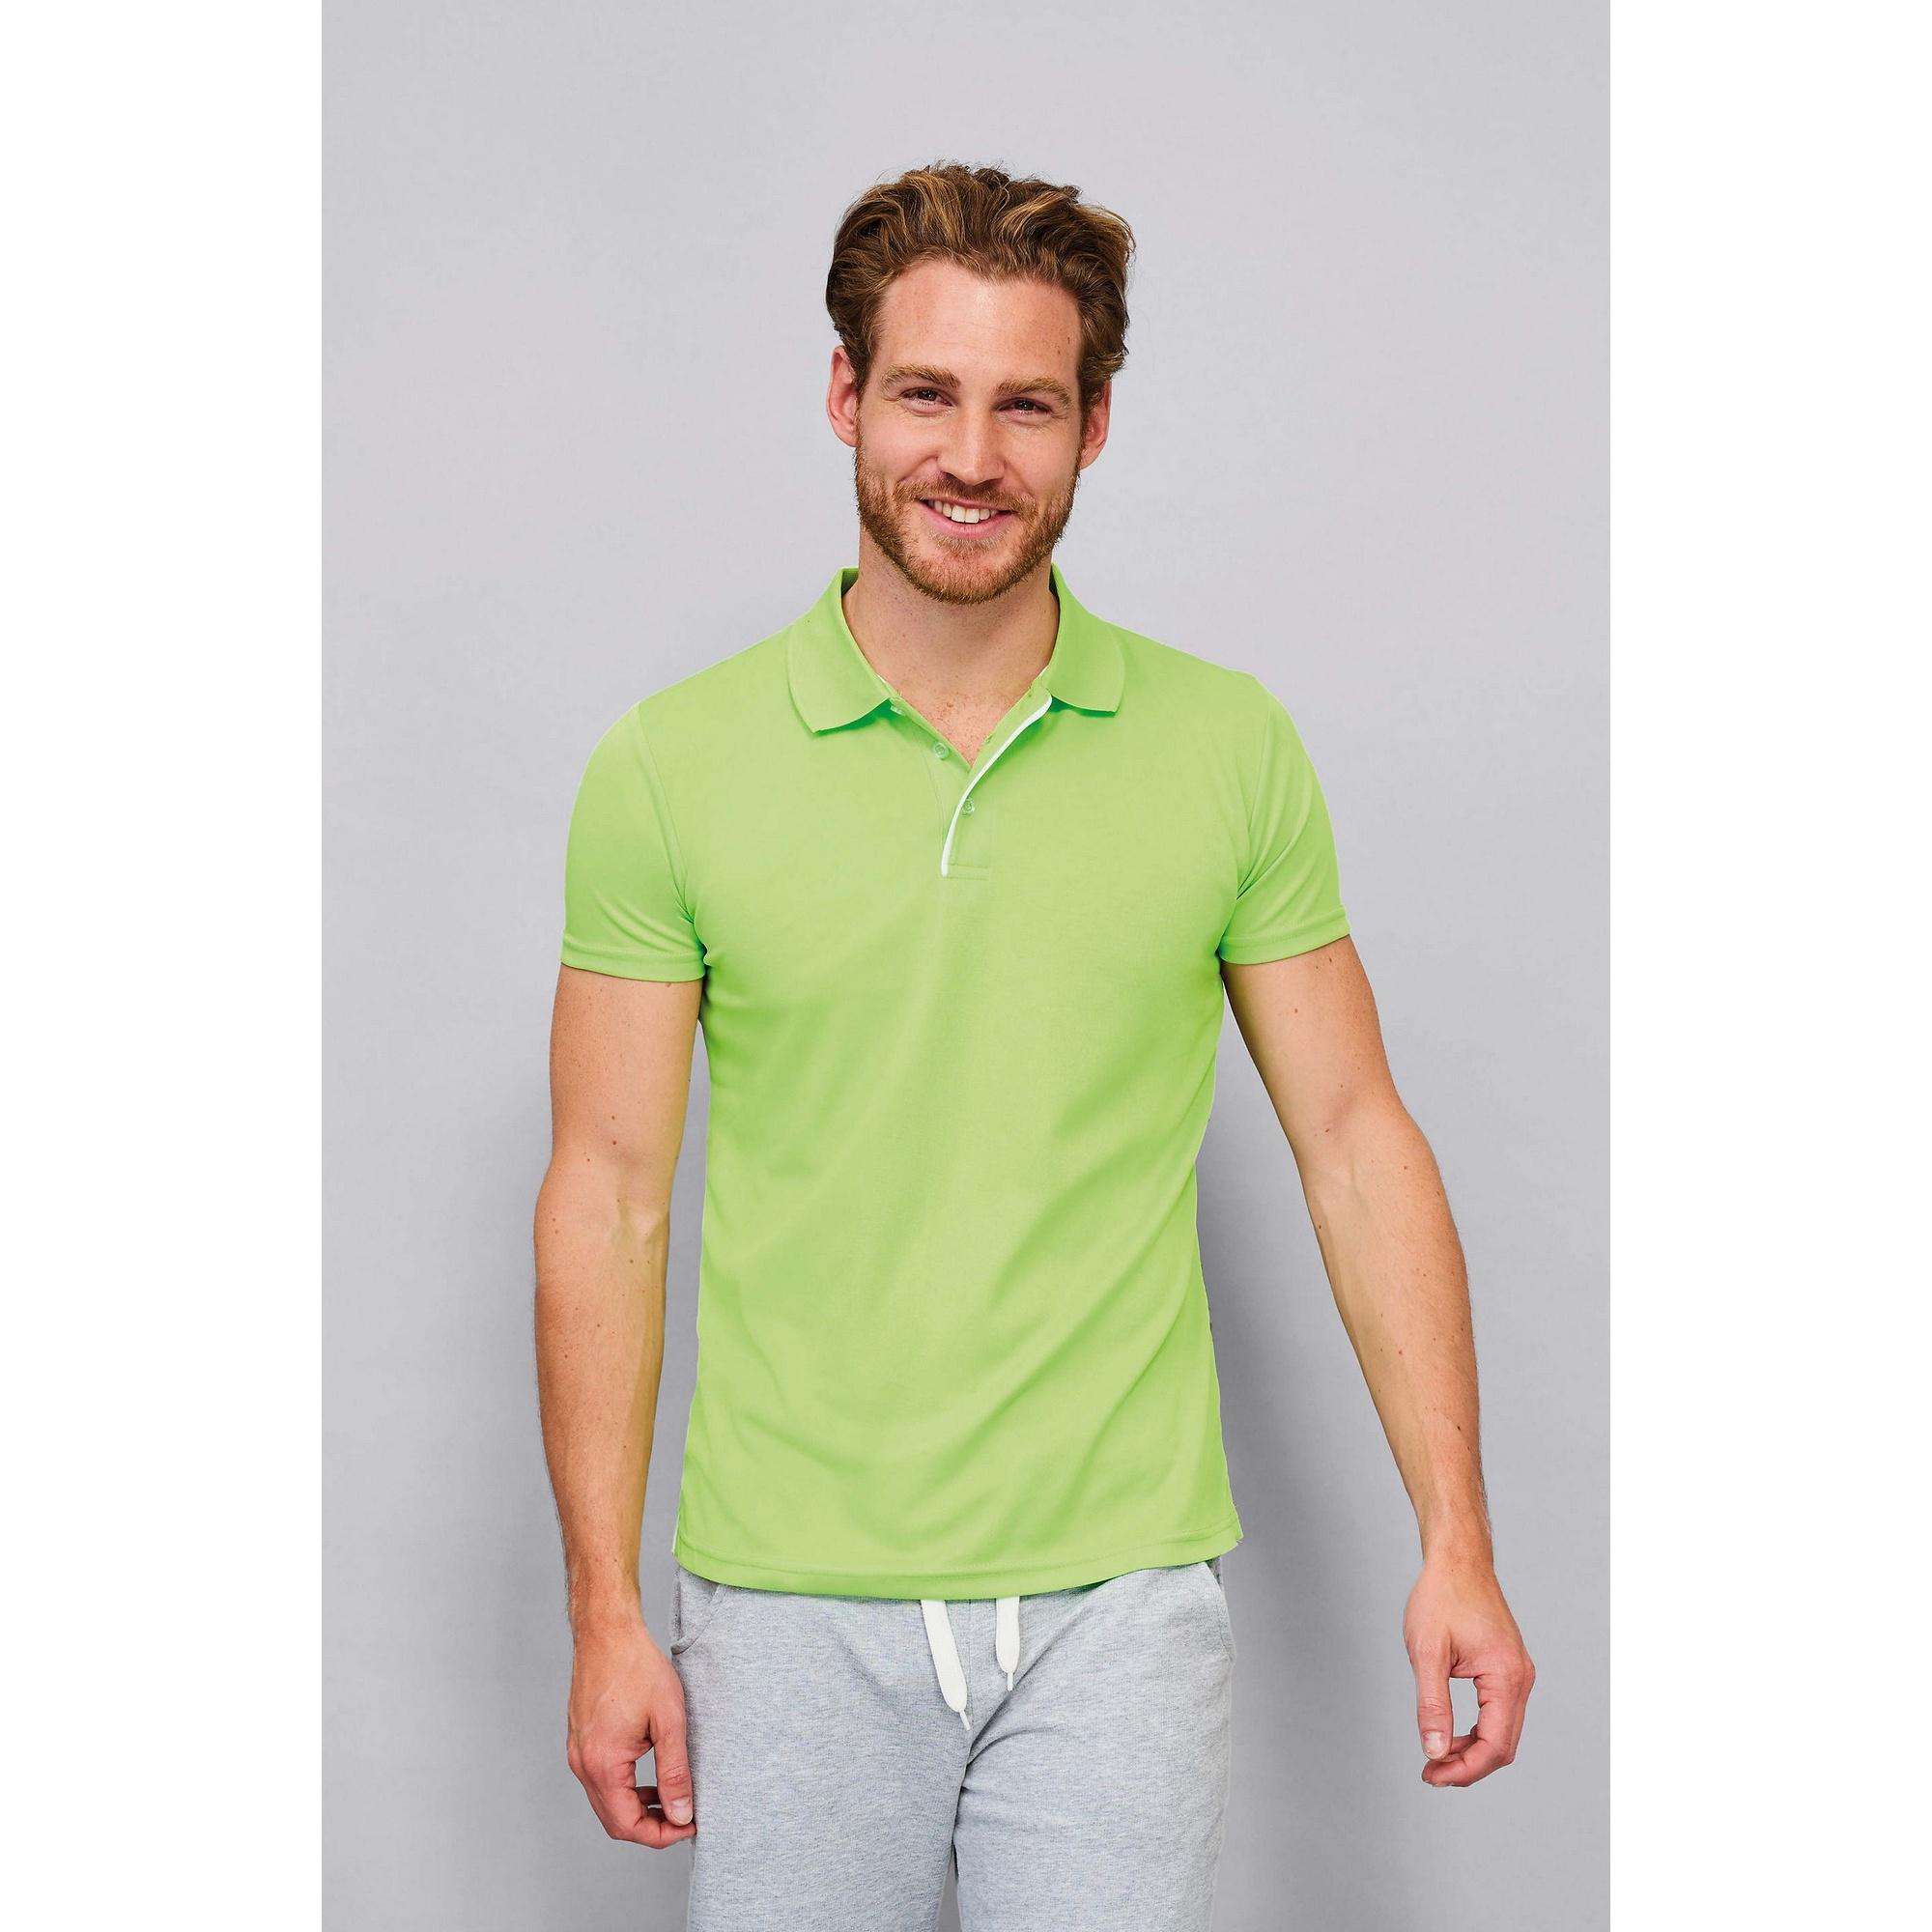 SOLS-Mens-Performer-Short-Sleeve-Pique-Plain-Casual-Fashion-Polo-Shirt-PC2162 thumbnail 12